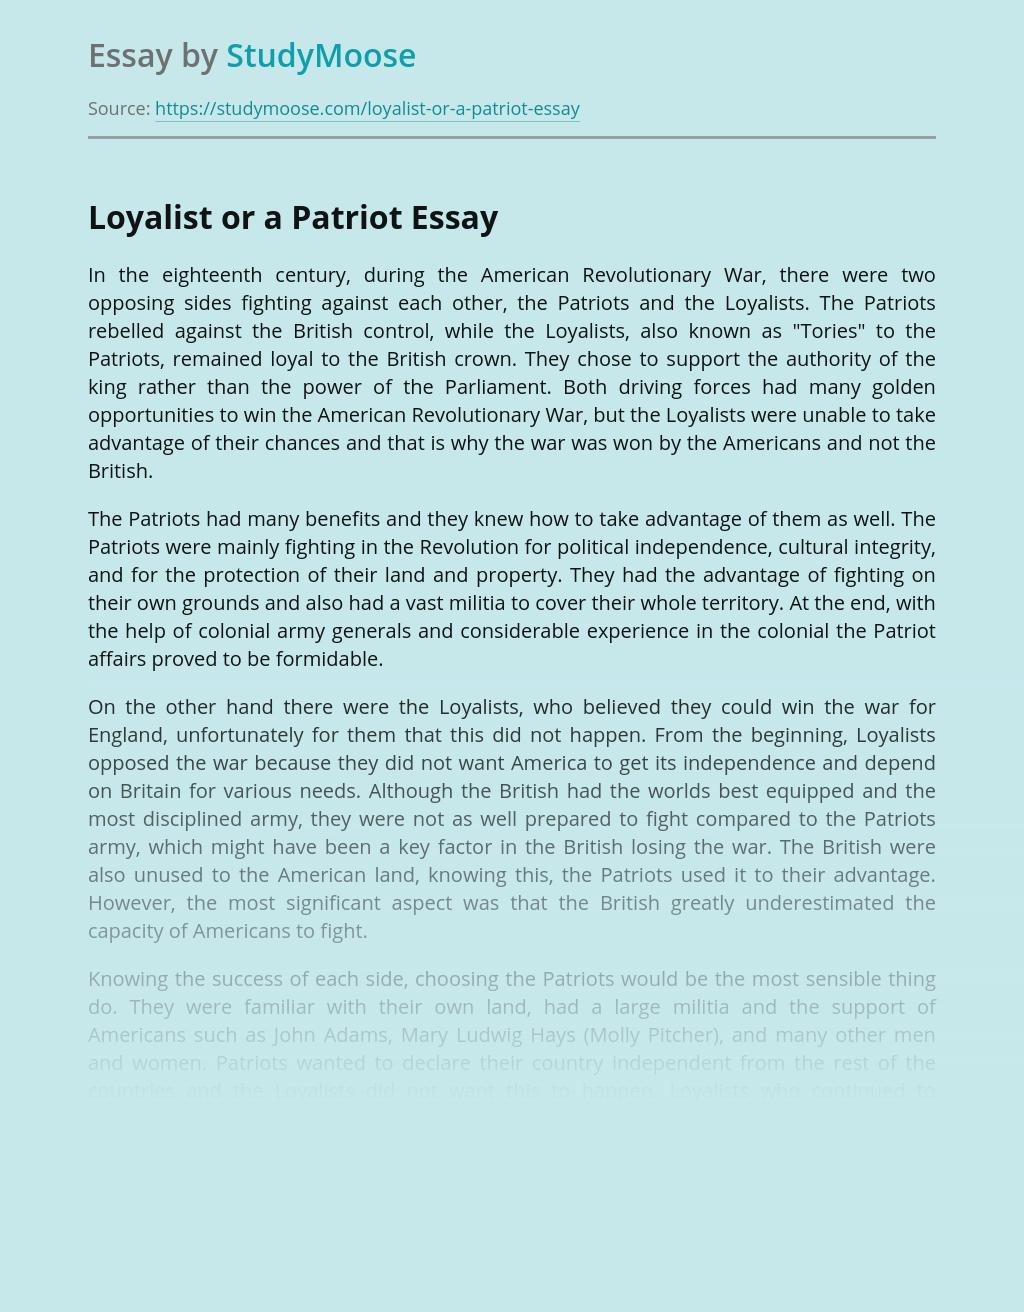 Loyalist or a Patriot